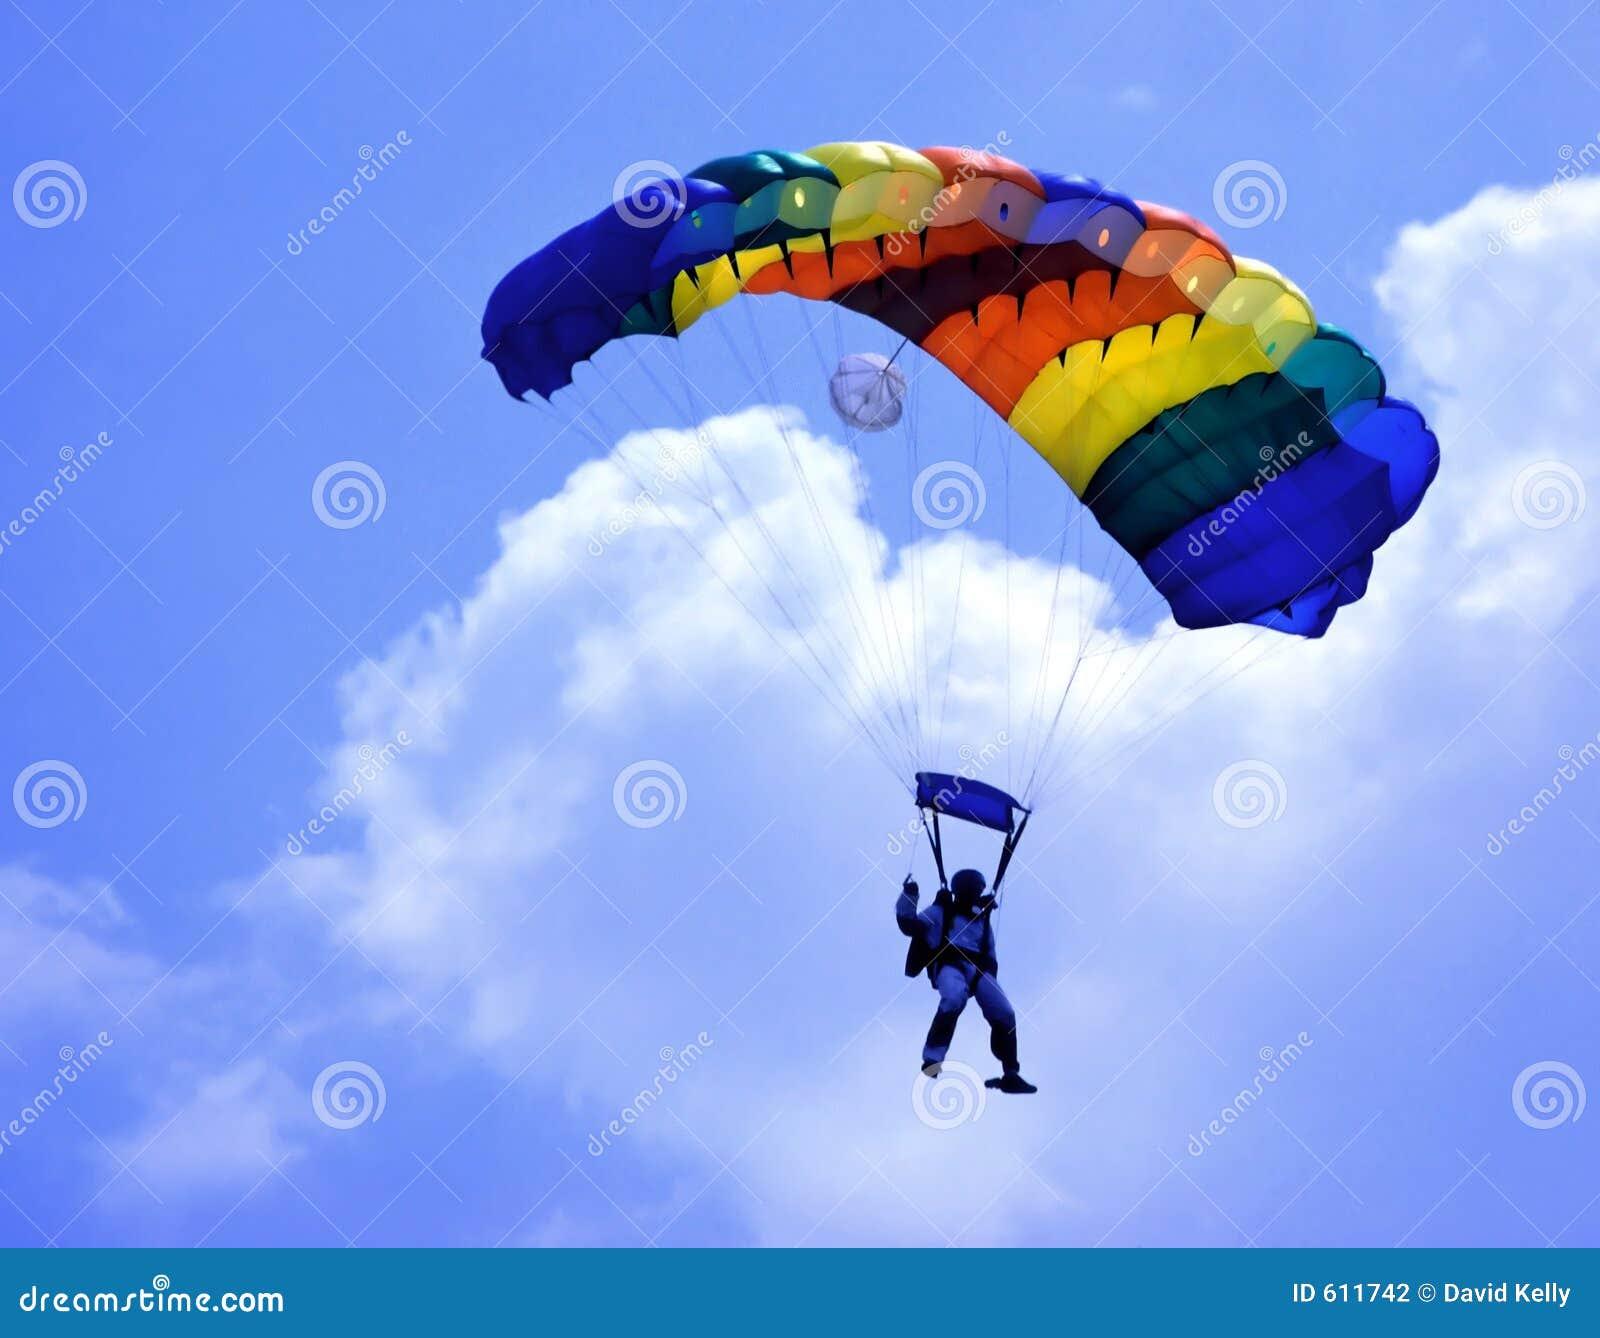 Parachute Stock Photography Image 611742